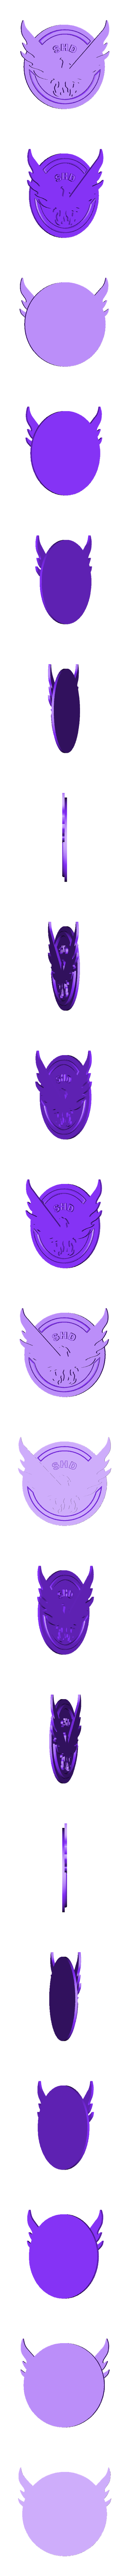 Division_Logo.stl Download free STL file The Division Logo • 3D printer template, Double_Alfa_3D